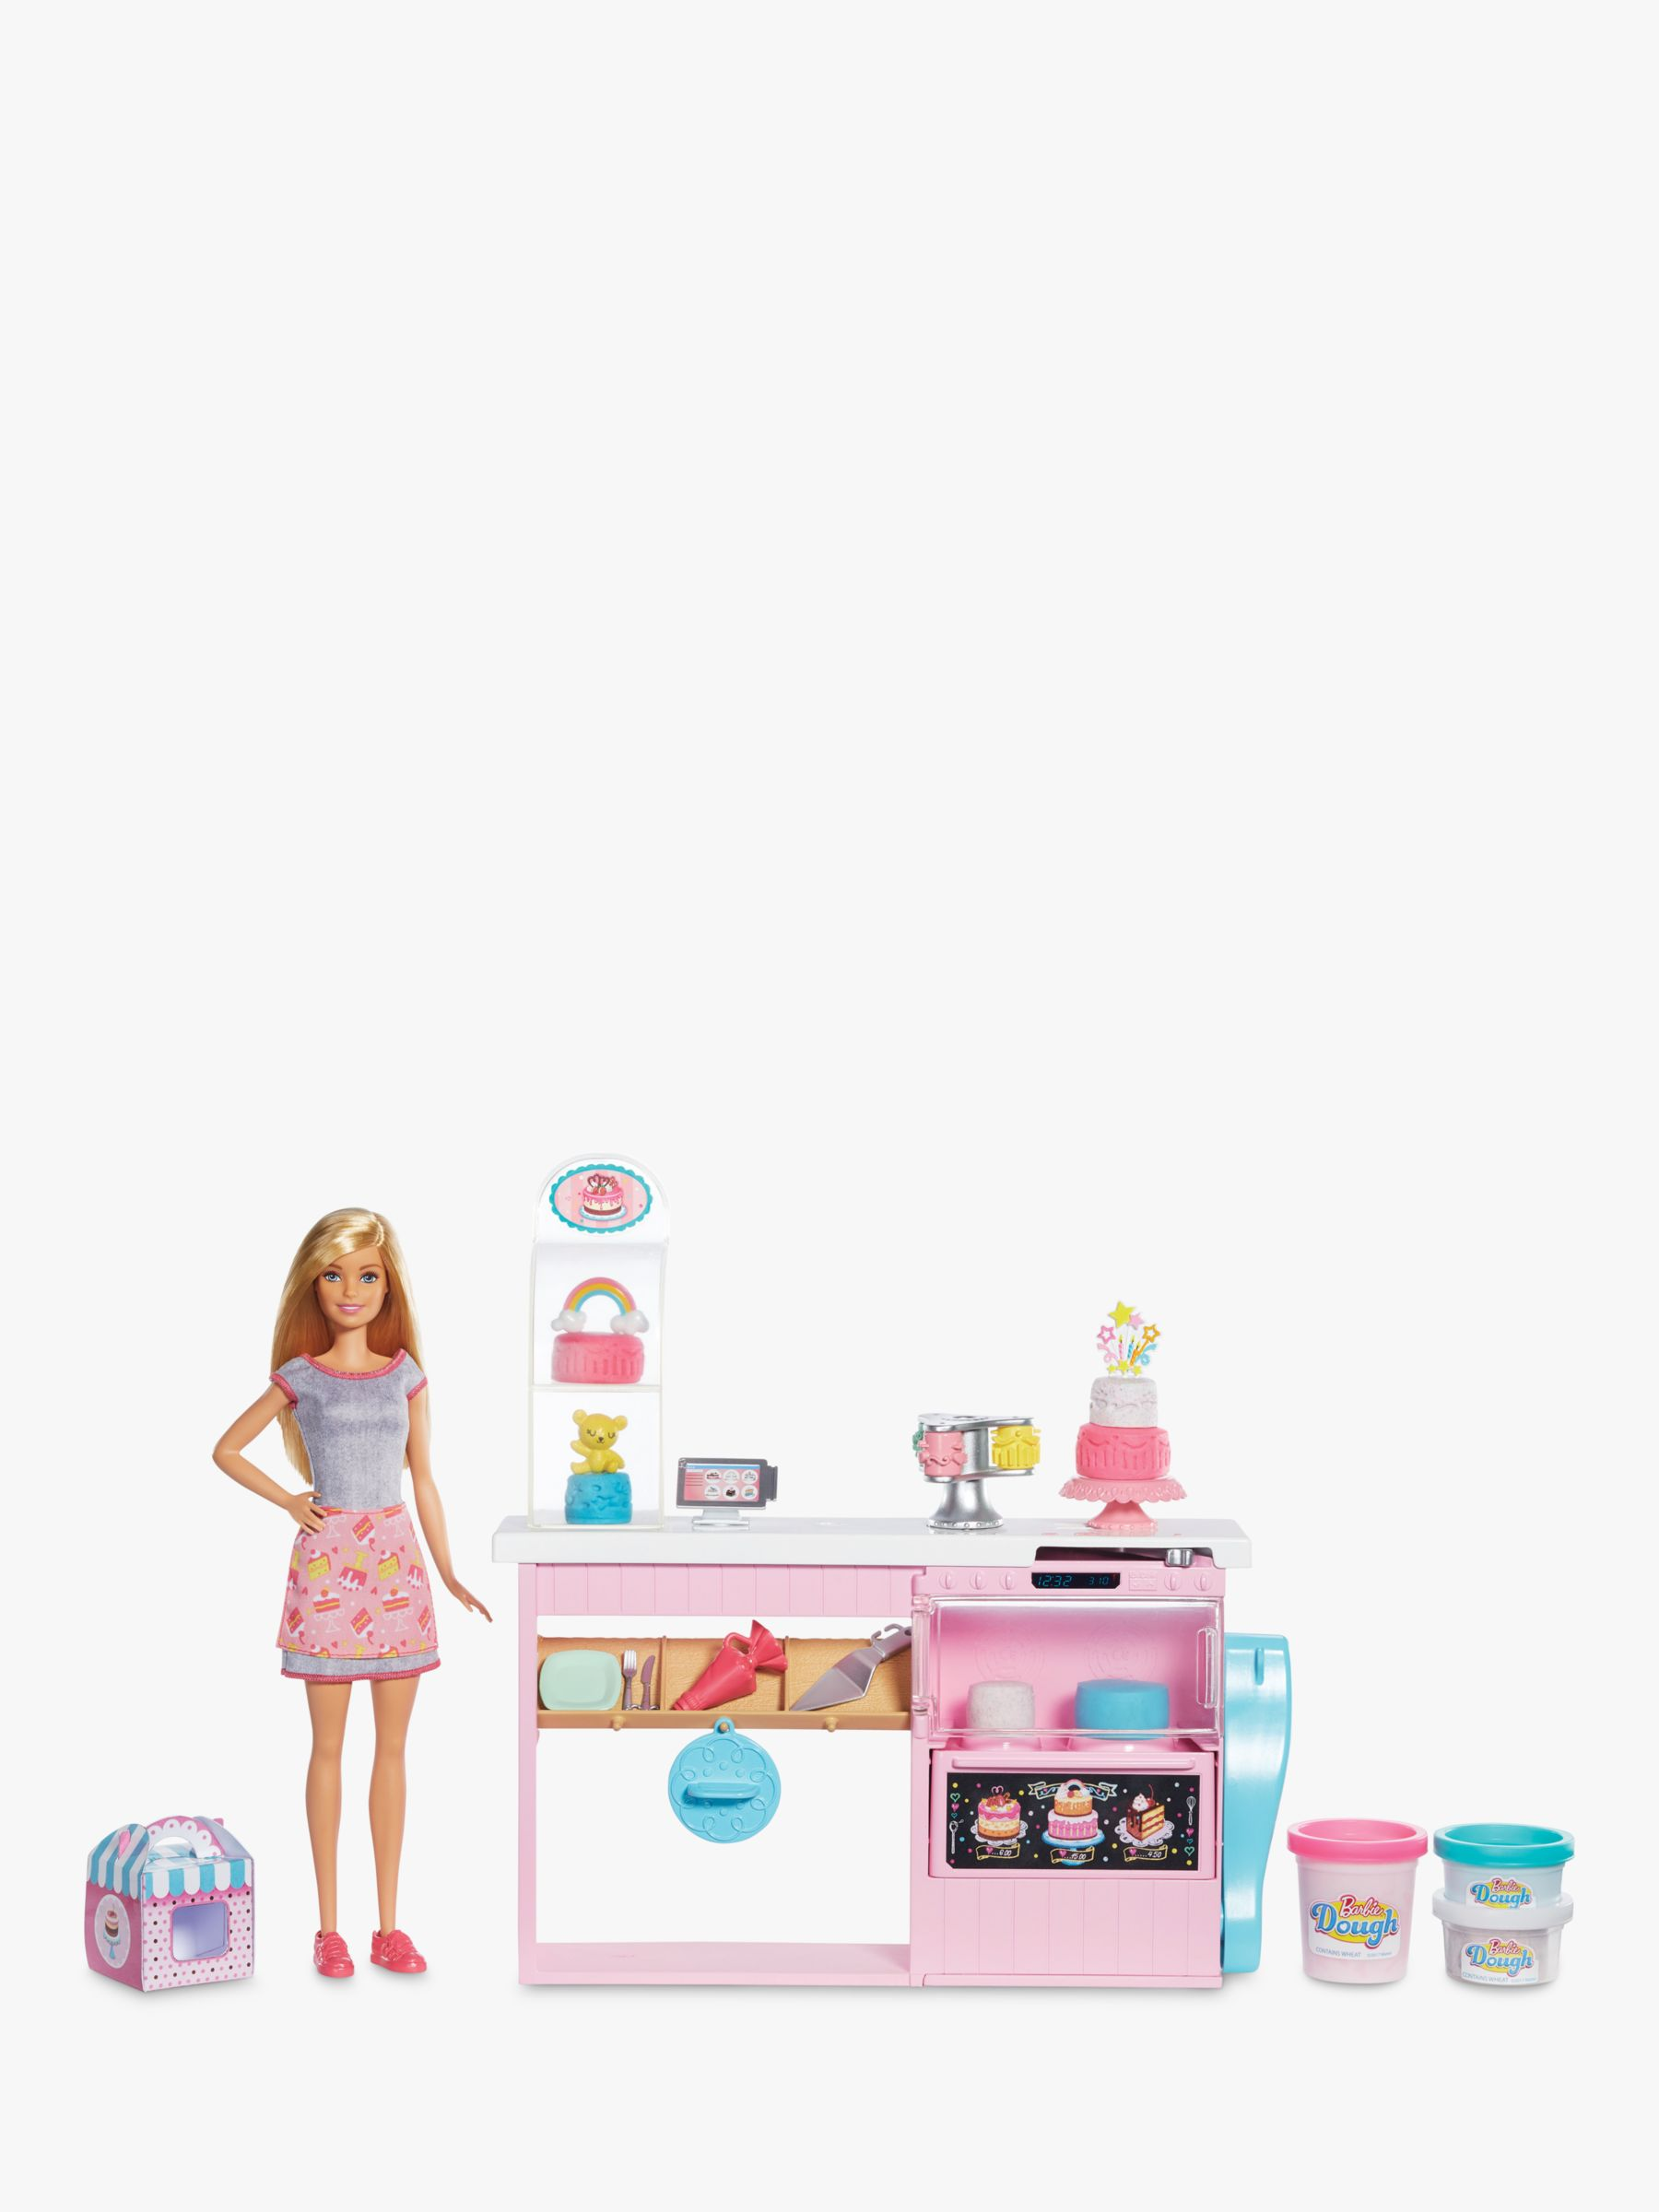 Barbie Barbie Cake Bakery Play Set